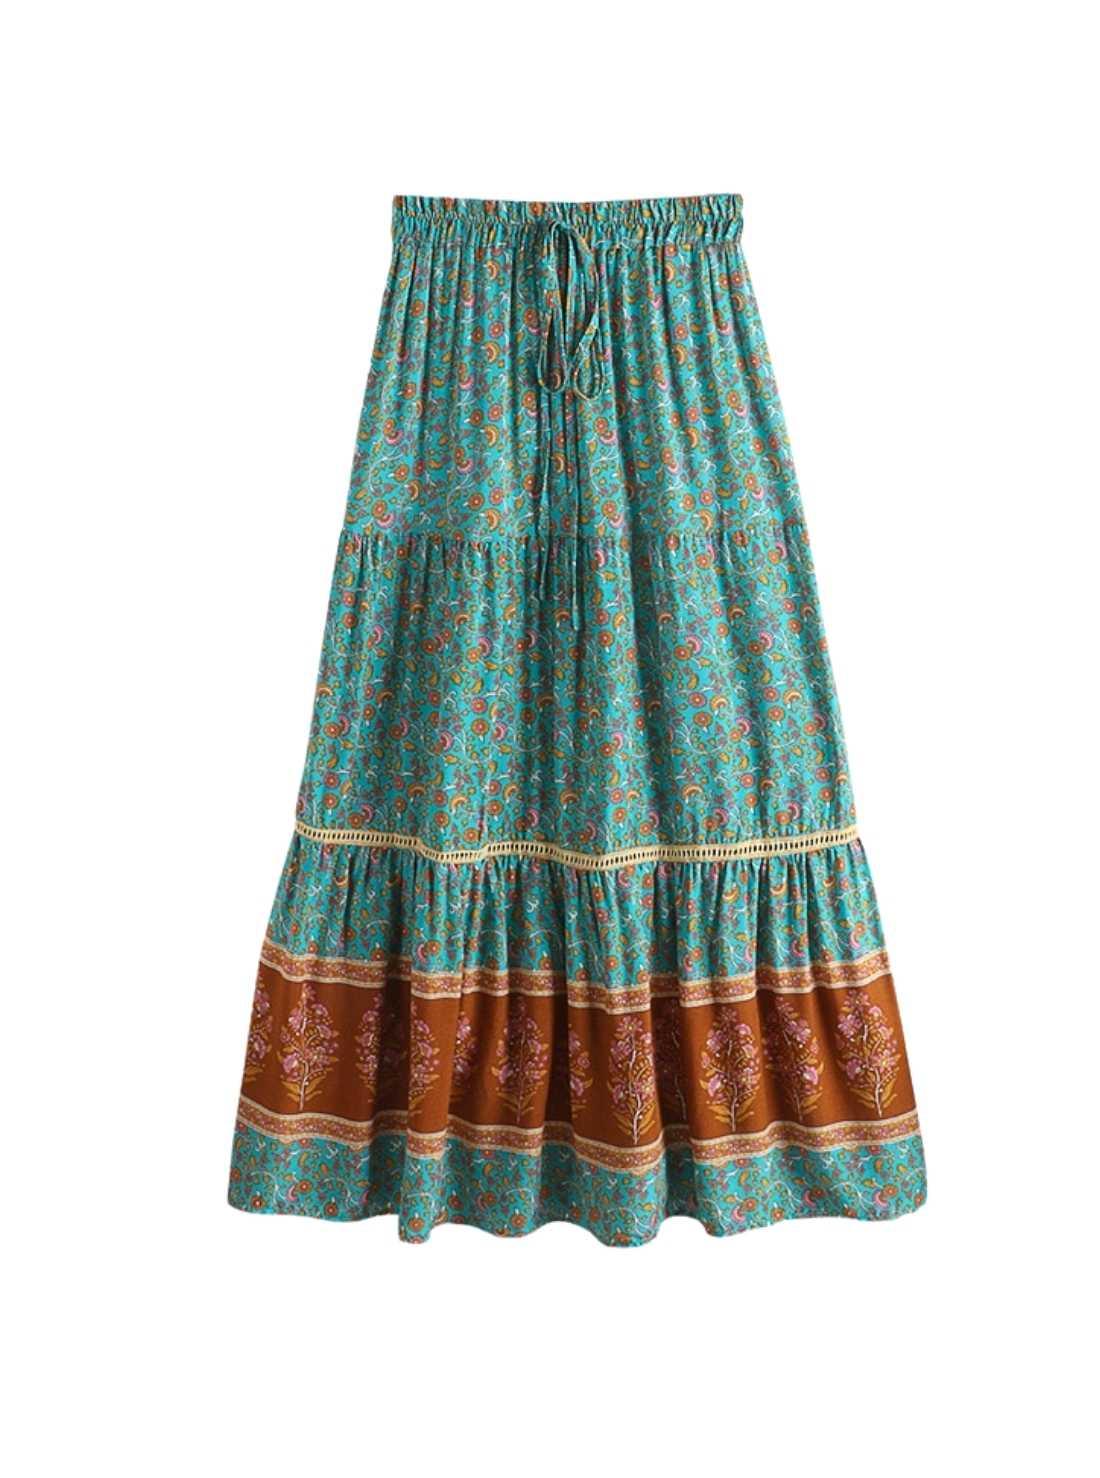 Floral print boho women skirt